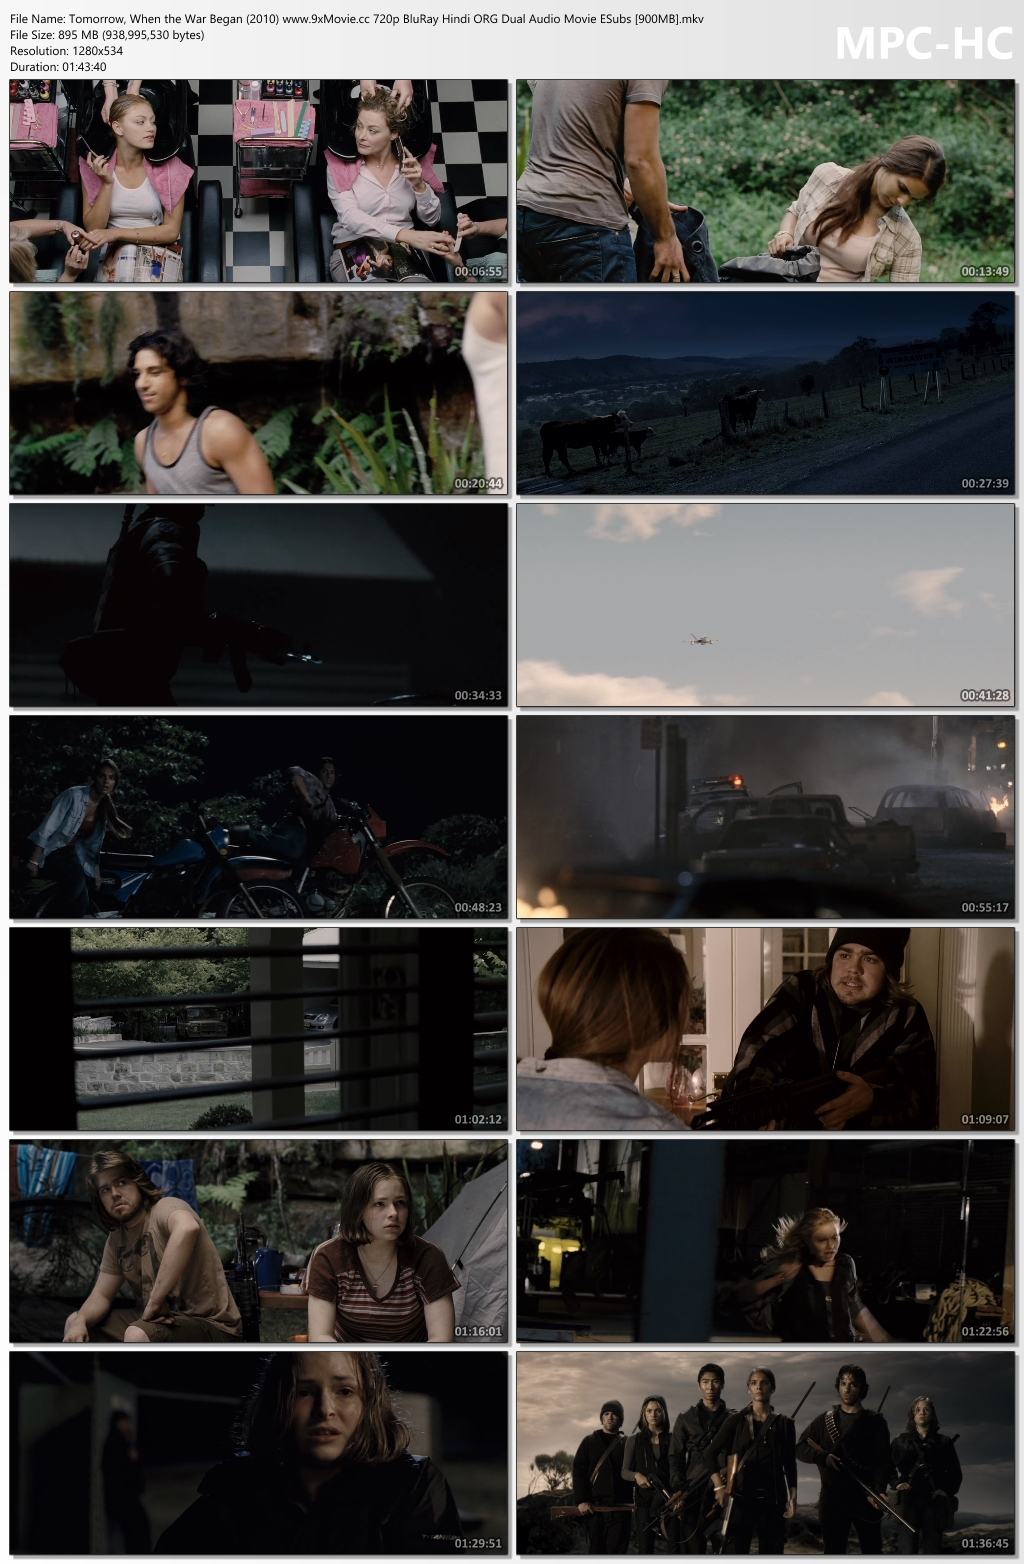 Tomorrow-When-the-War-Began-2010-www-9x-Movie-cc-720p-Blu-Ray-Hindi-ORG-Dual-Audio-Movie-ESubs-900-M